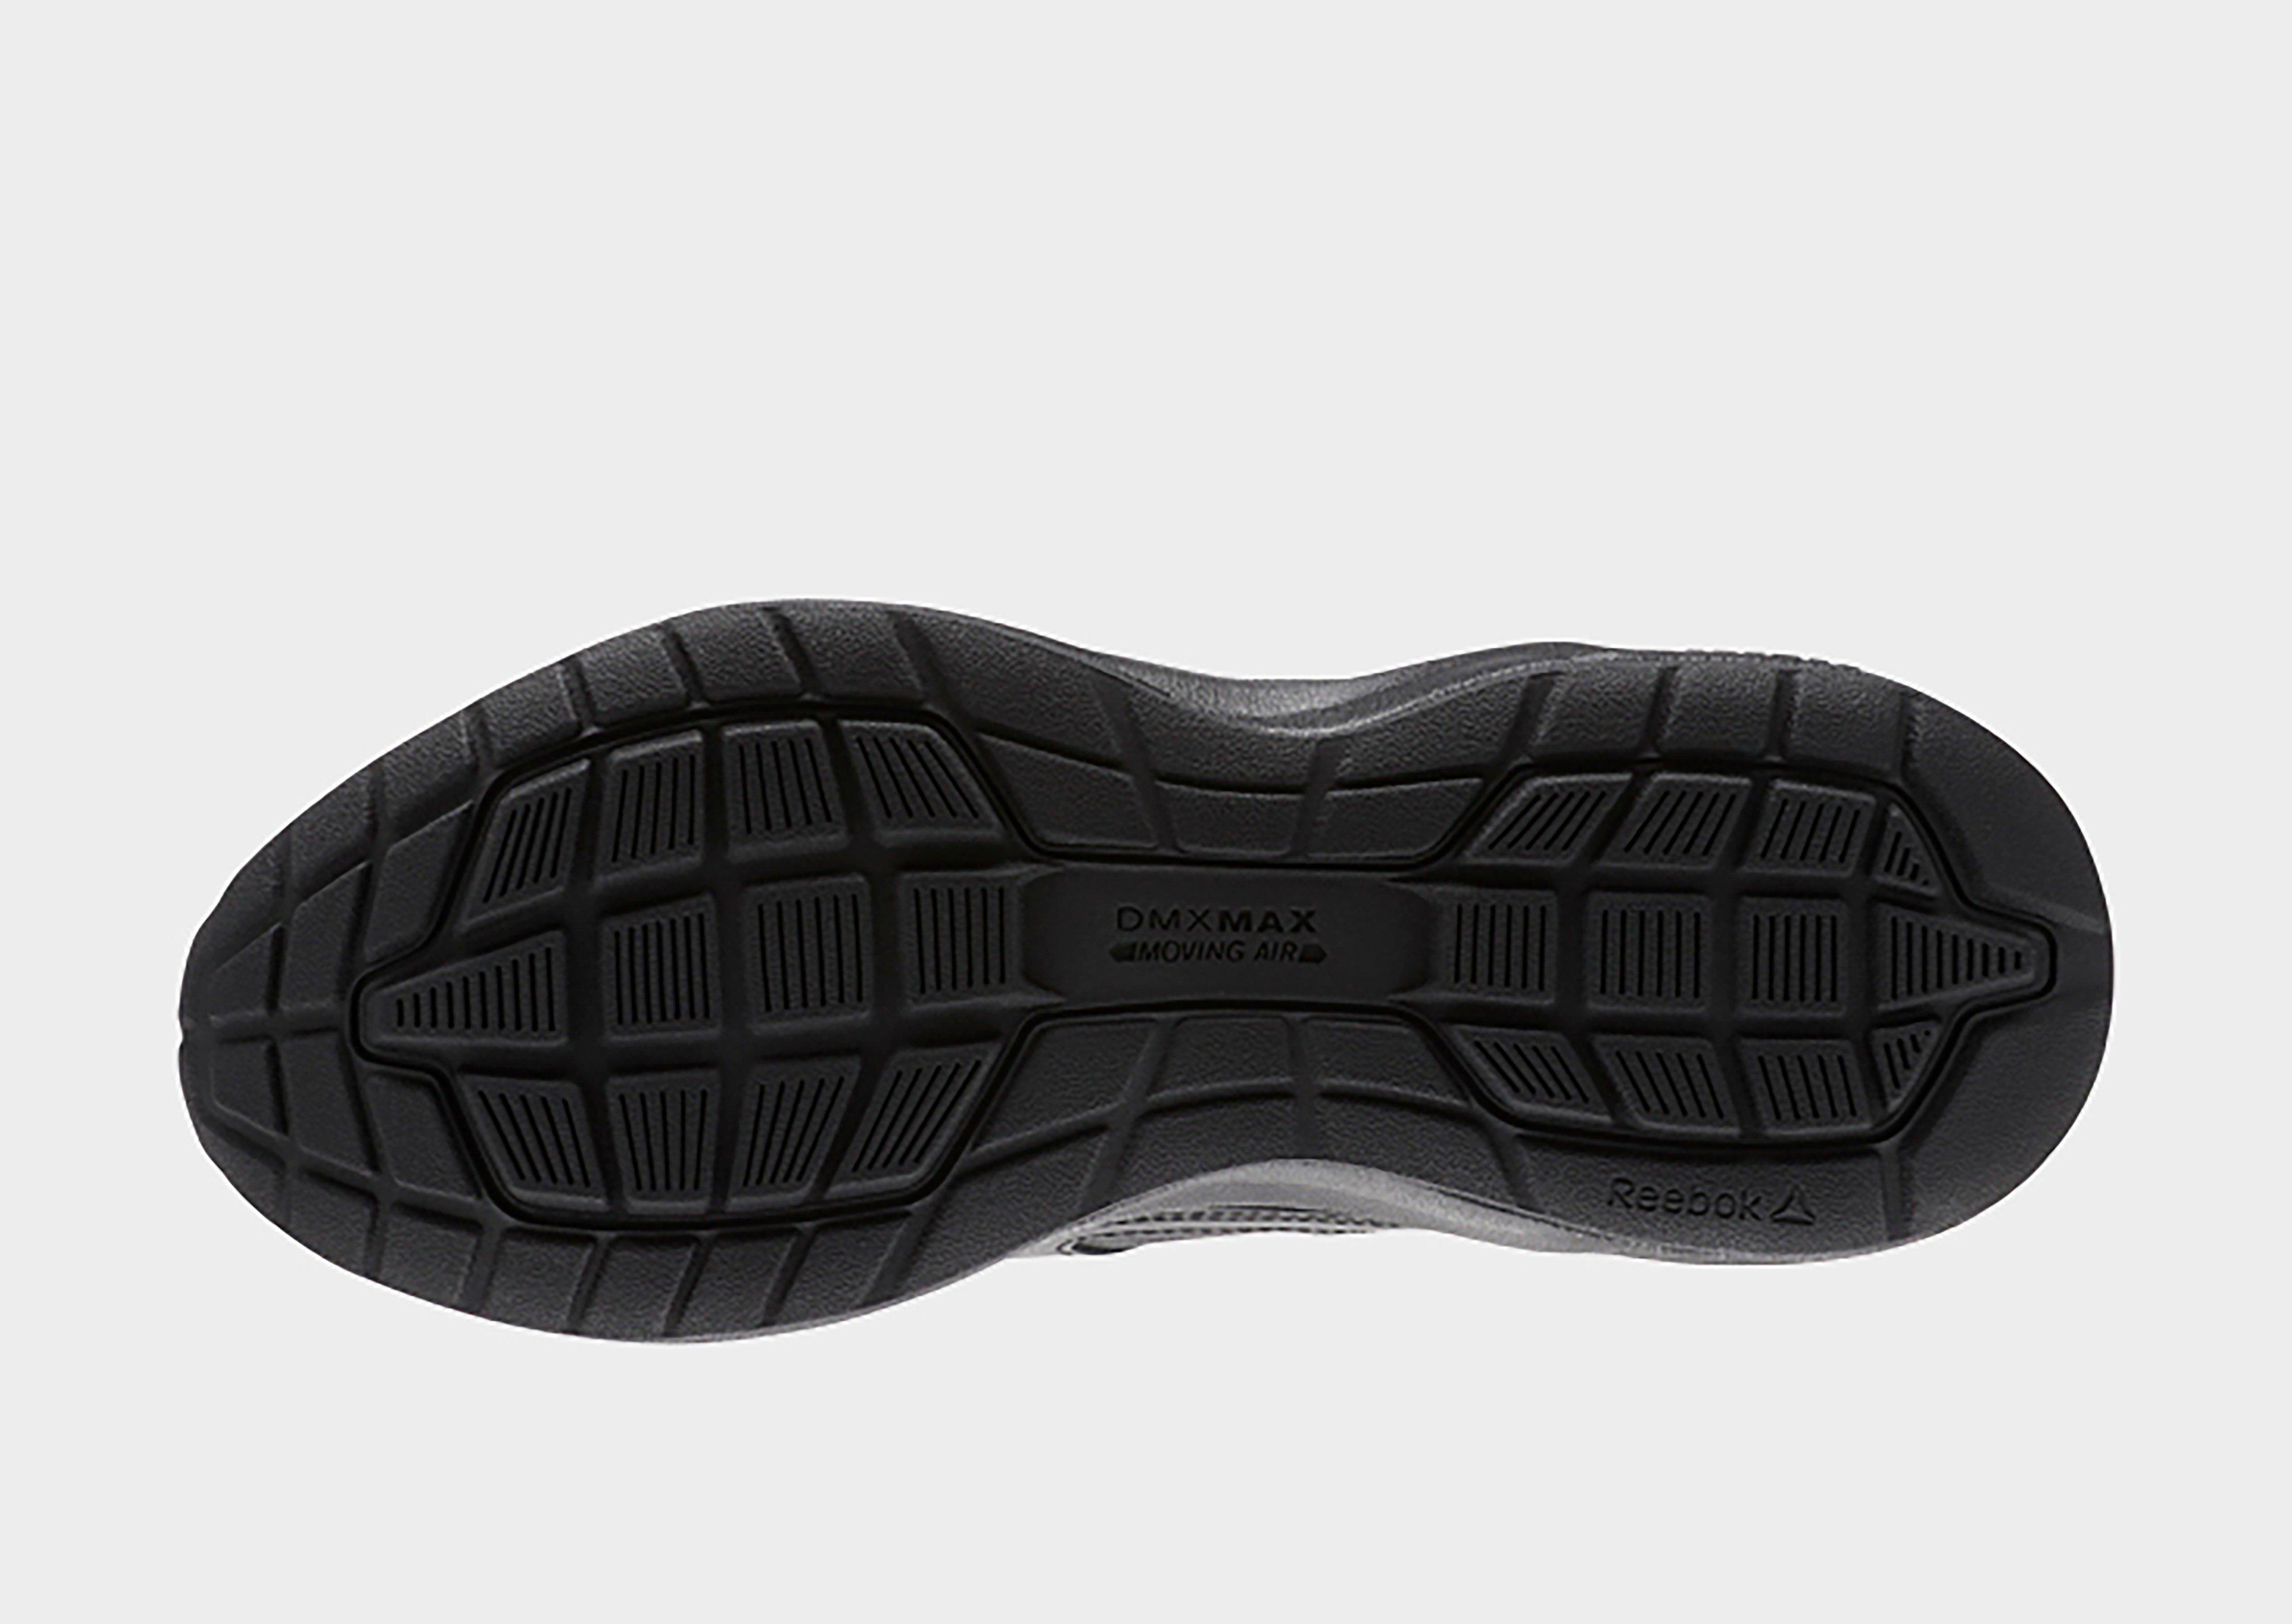 6c5ae15620ce Reebok - Black Walk Ultra 6 Dmx Max for Men - Lyst. View fullscreen